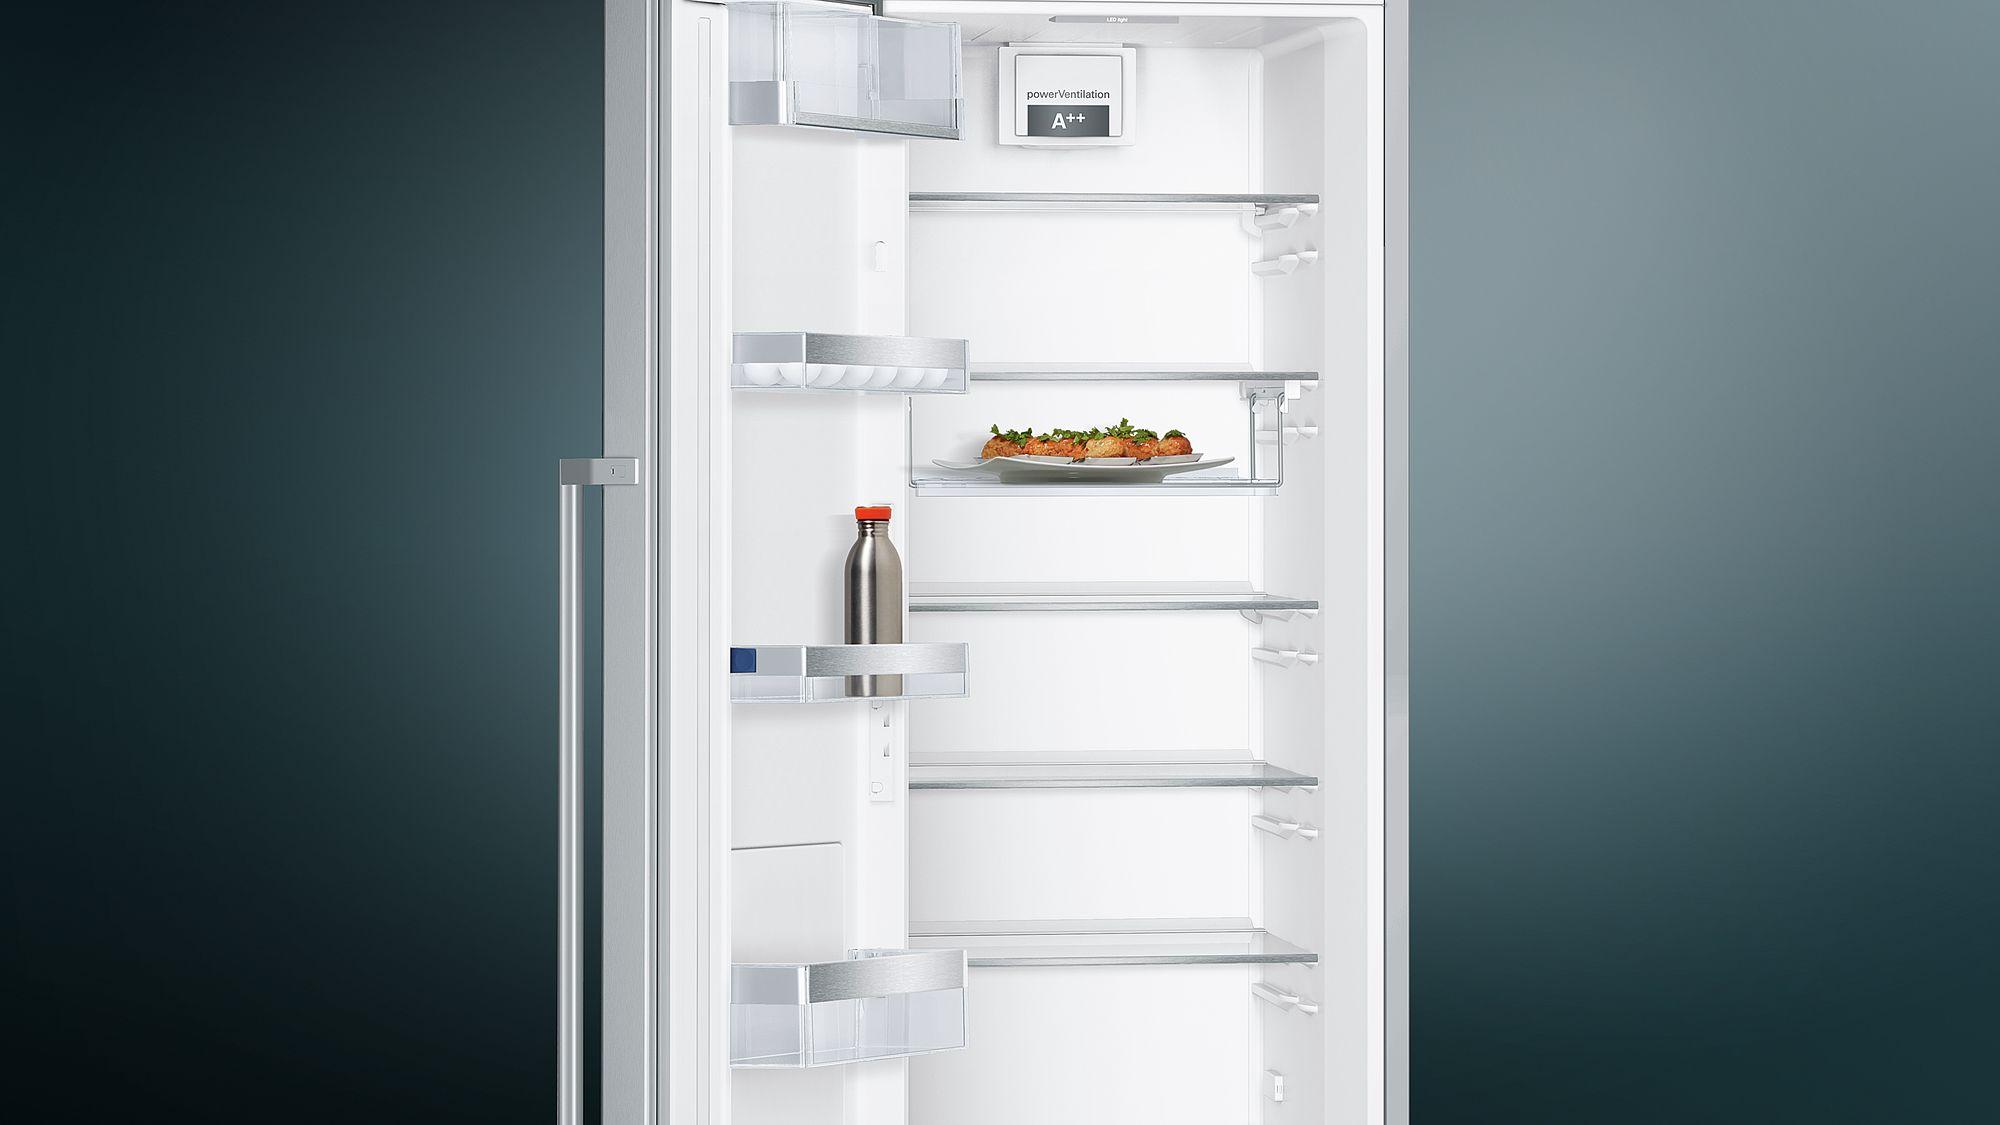 Aeg Kühlschrank Rfb52412ax : Standkühlschrank edelstahl siemens stand kühlschrank iq tür